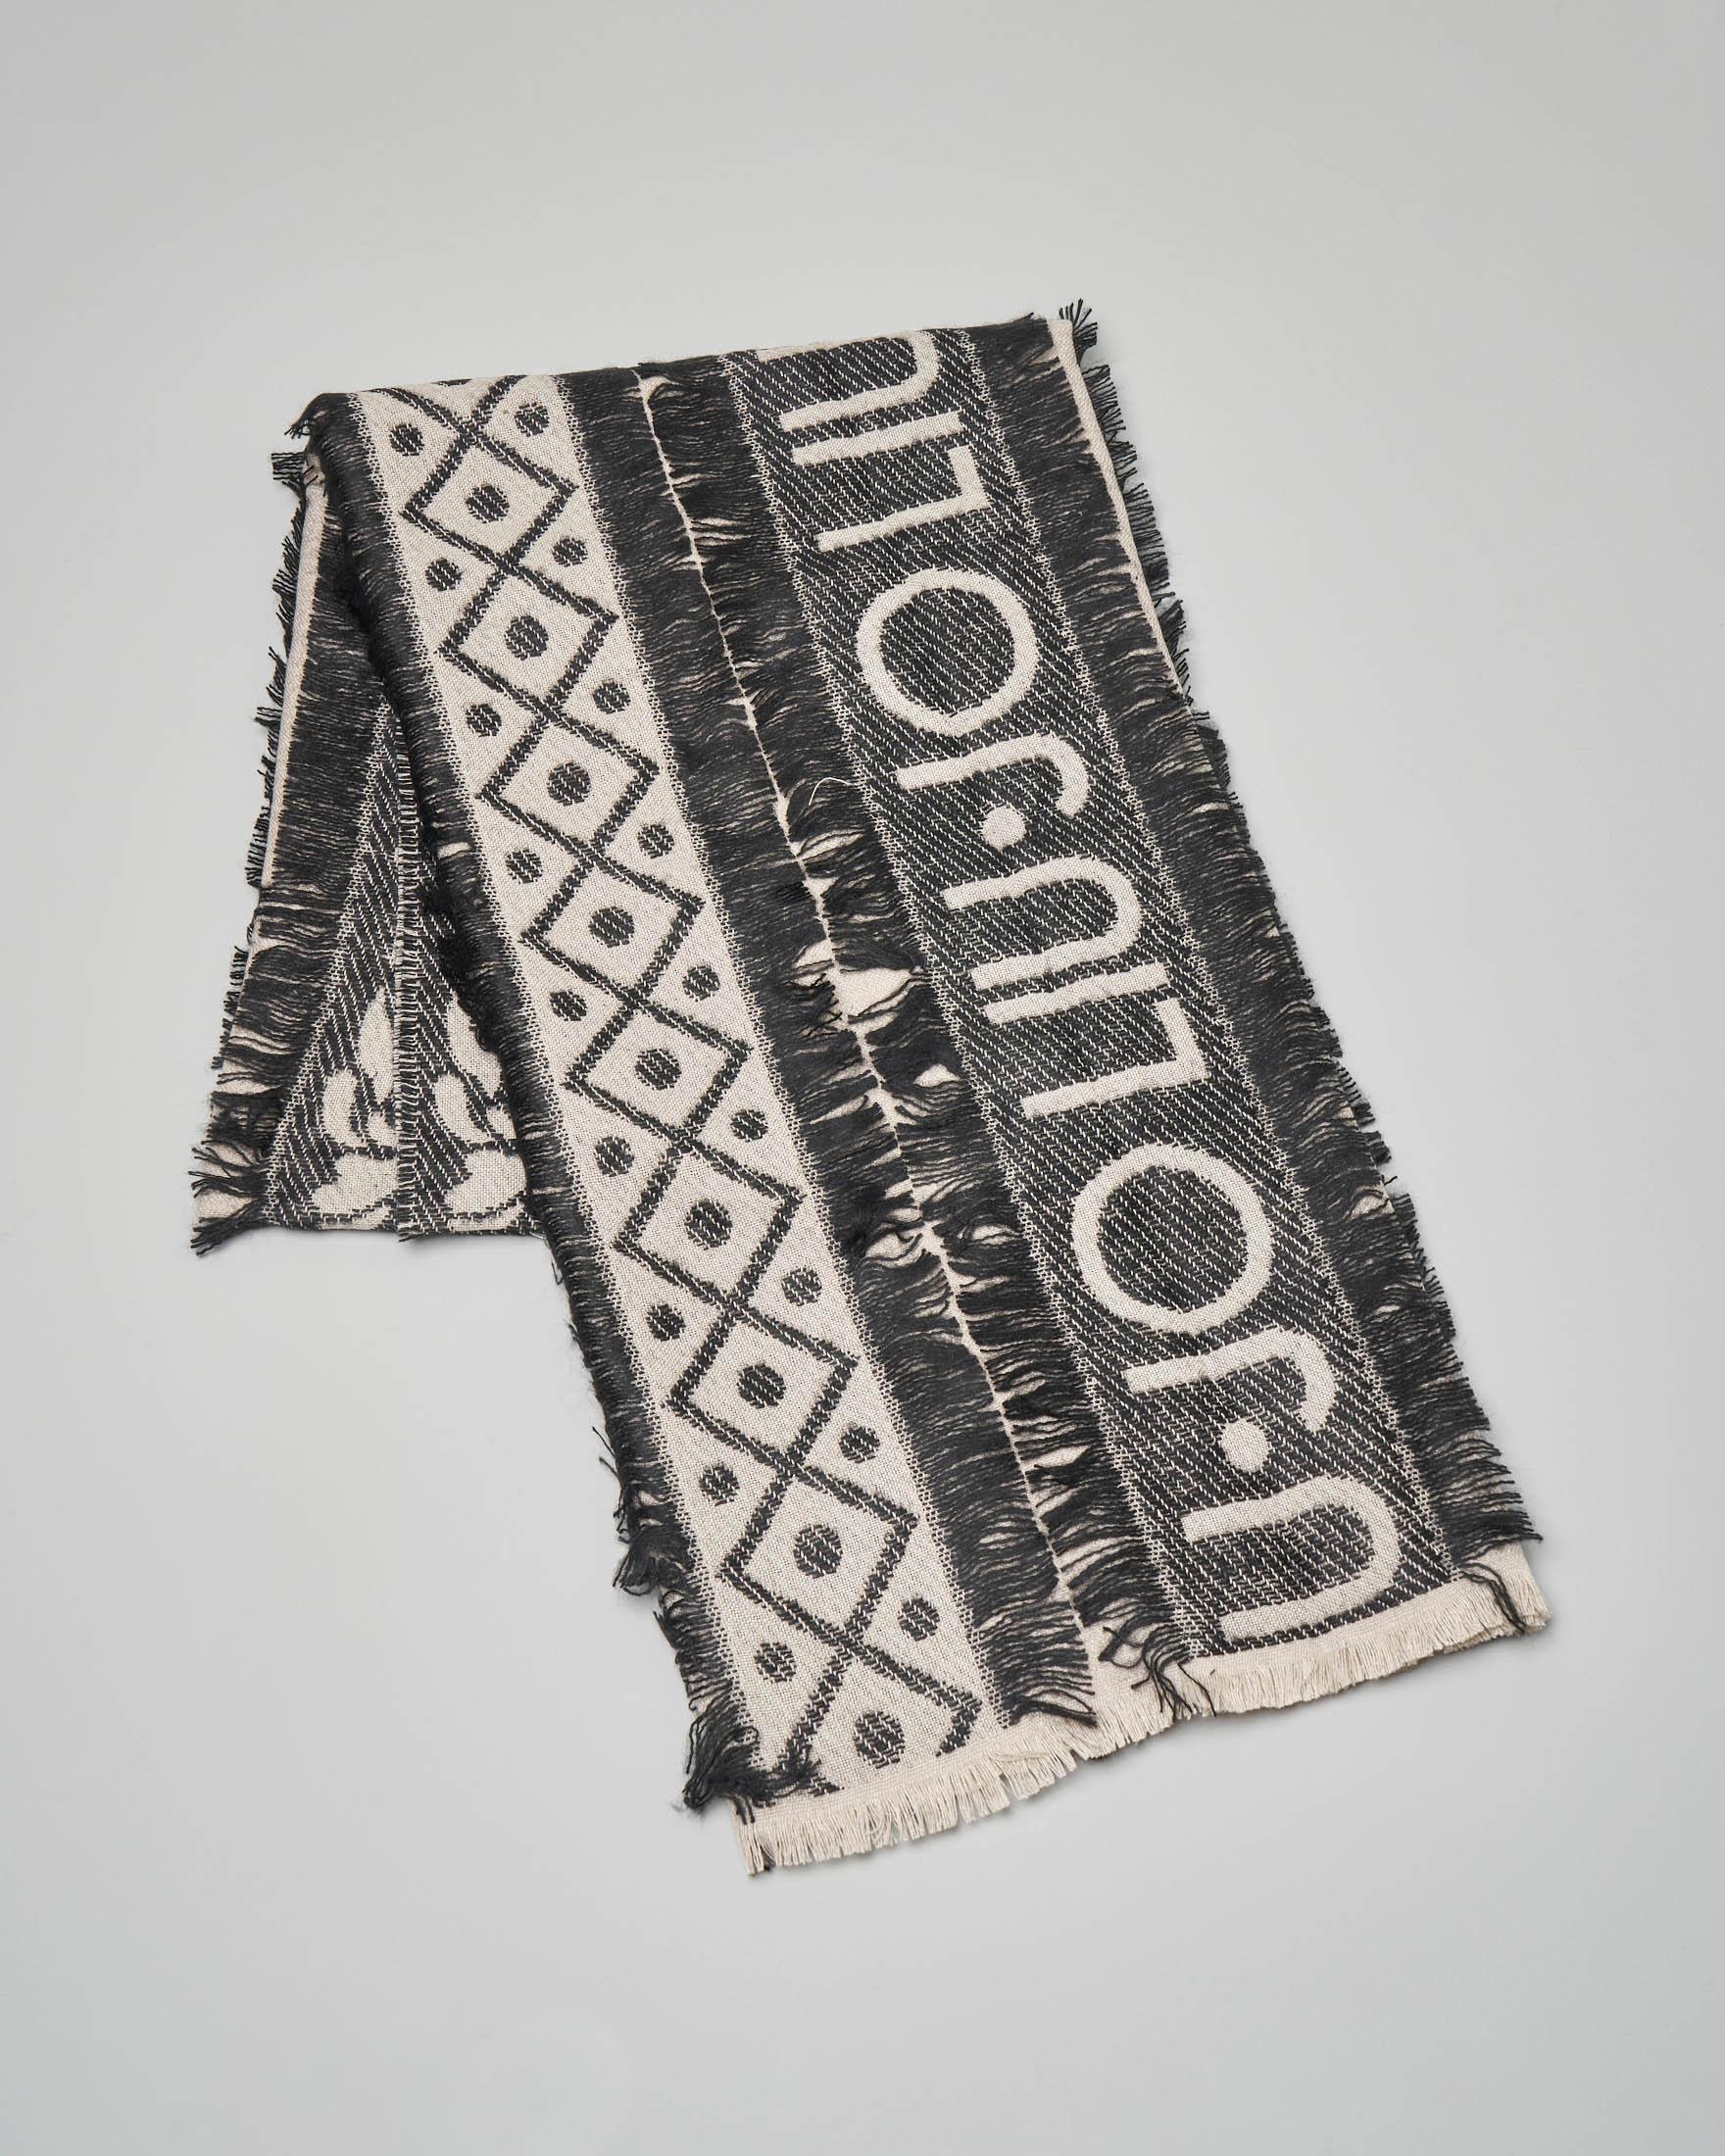 Stola bianca e nera in fil coupé e jacquard con scritta logo